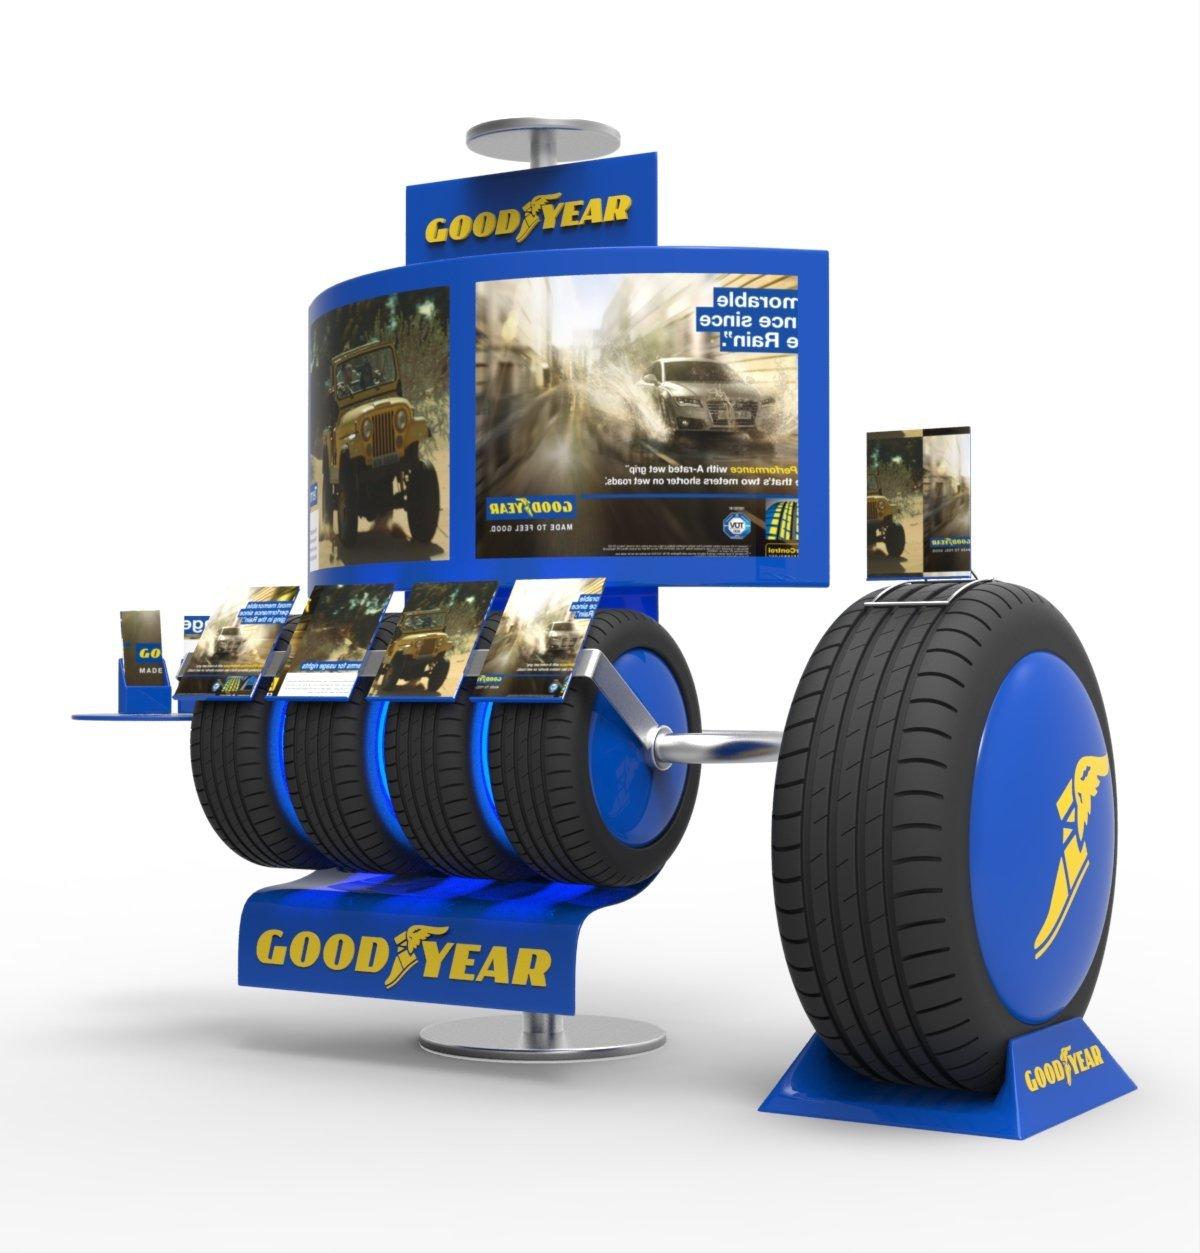 Goodyear - Display unit - 2015